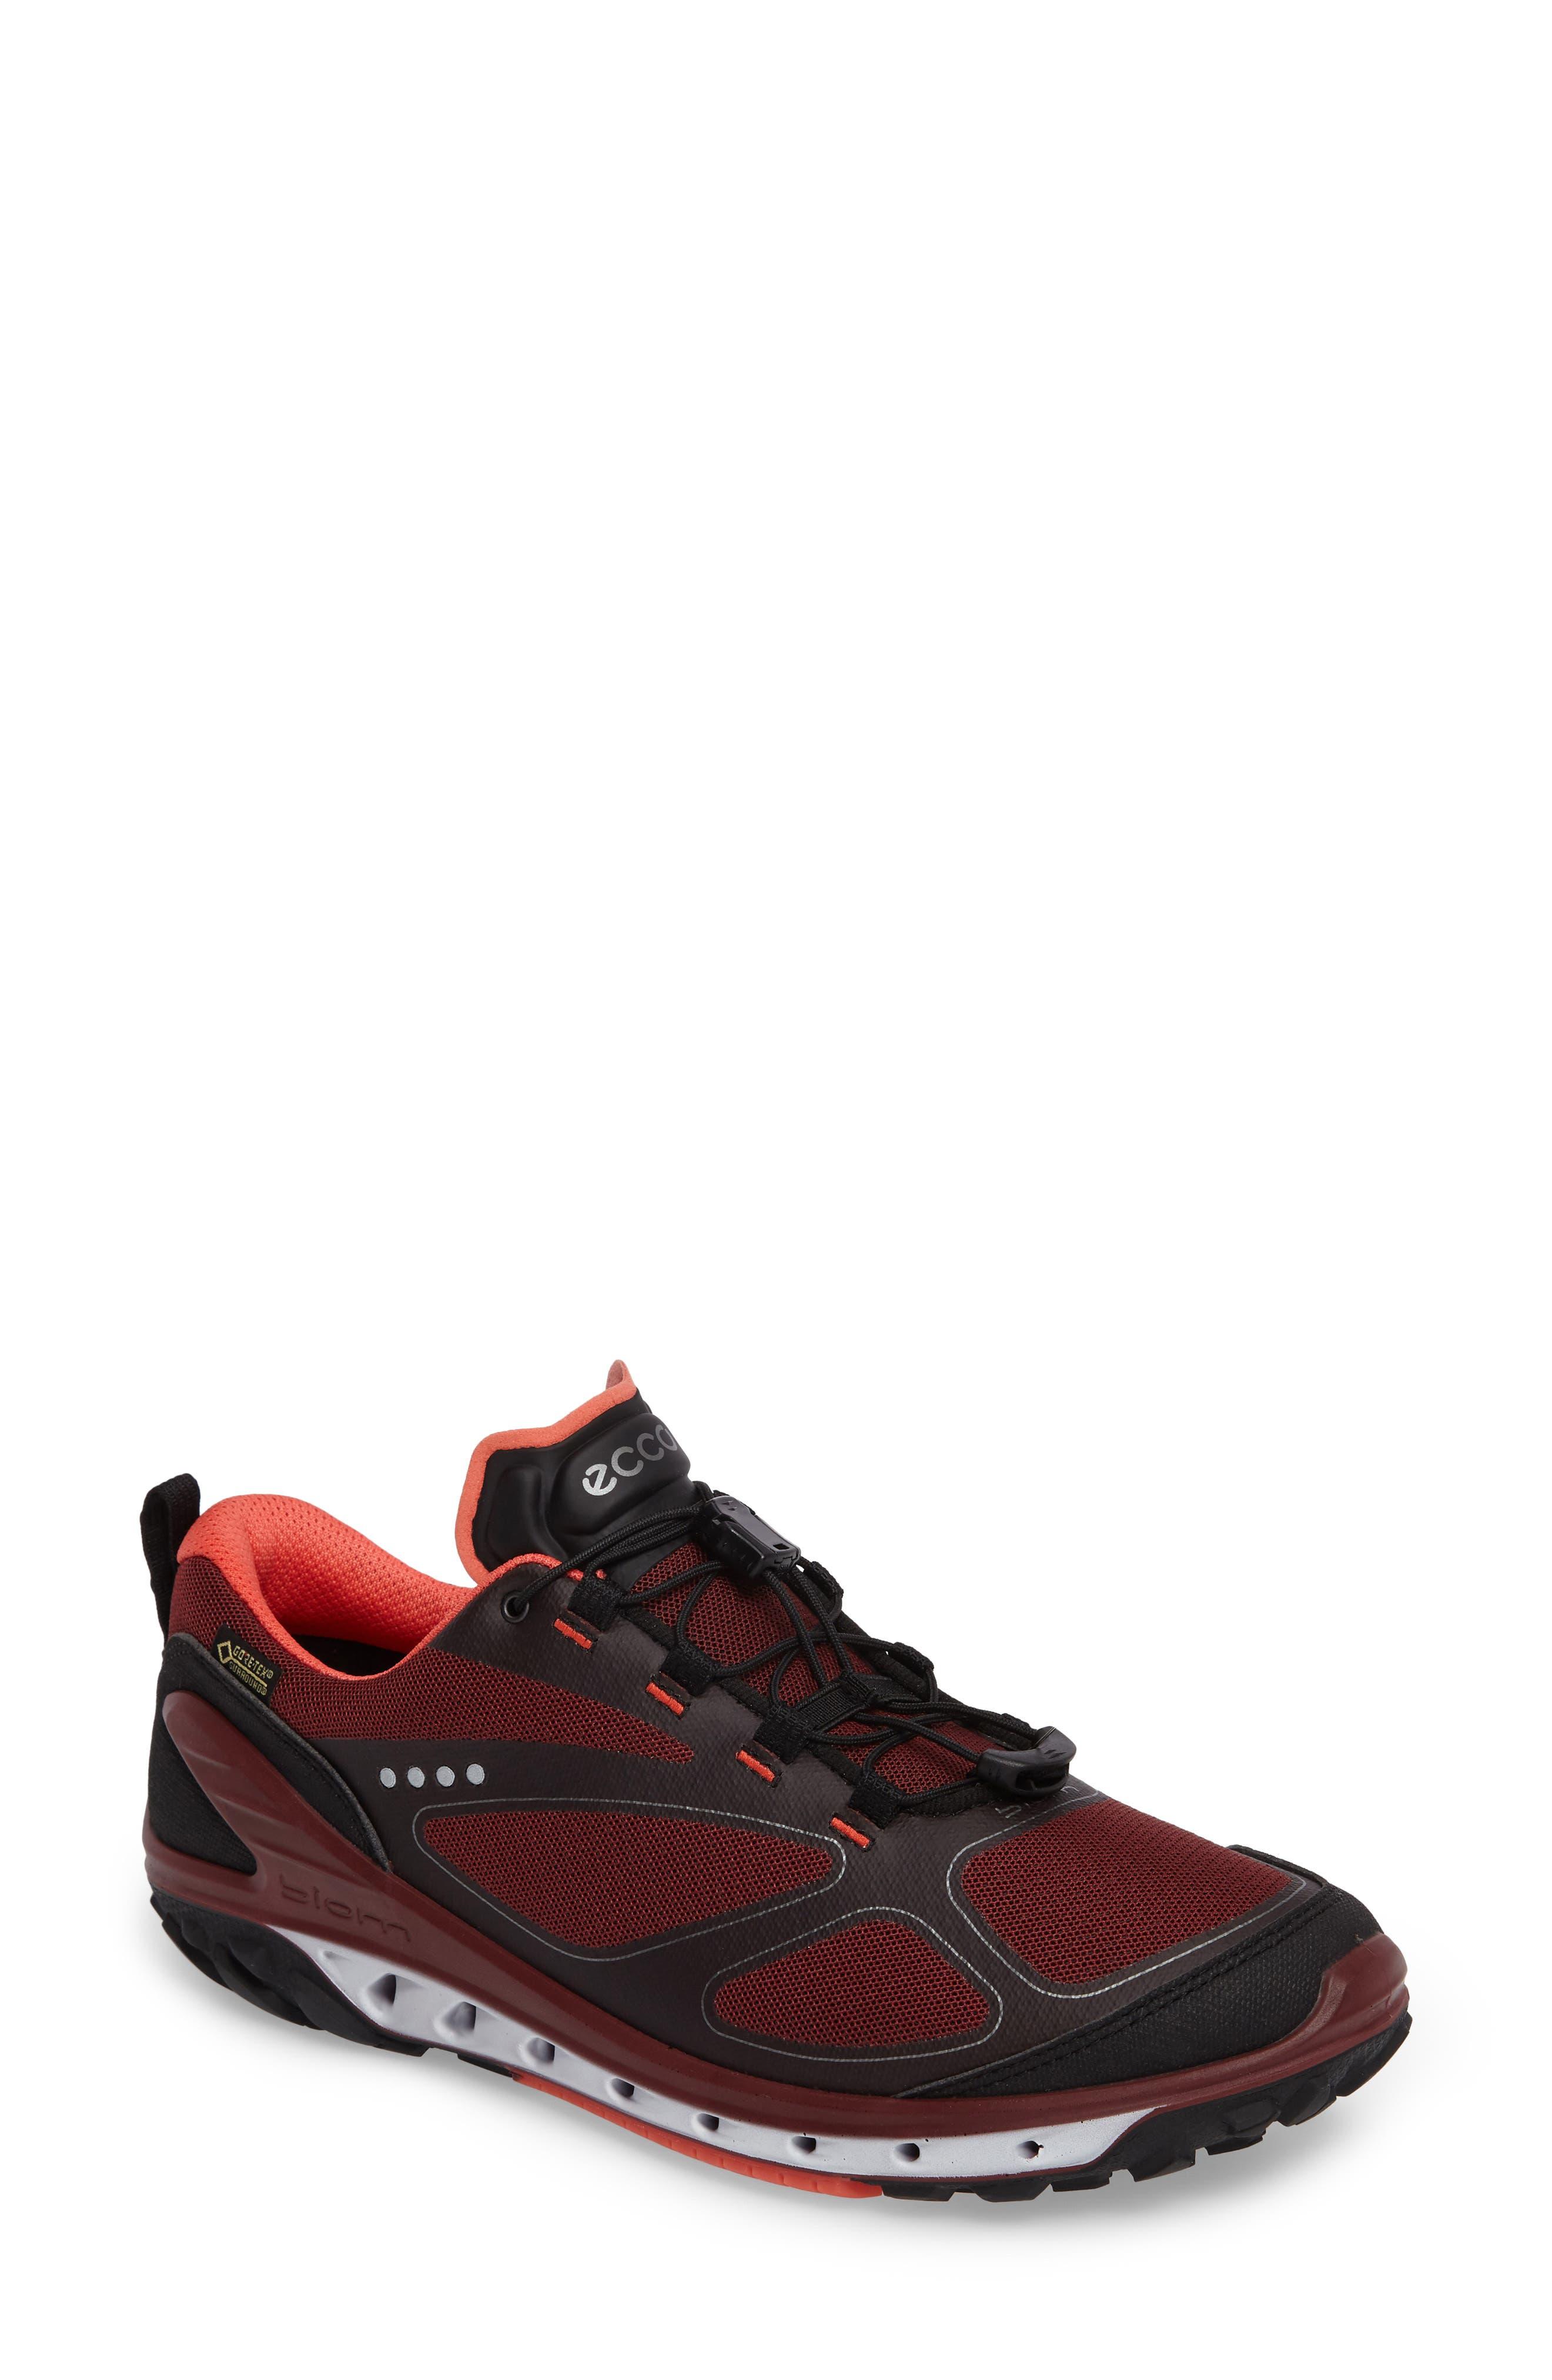 BIOM Venture GTX Sneaker,                         Main,                         color, Black/ Coral Blush Fabric